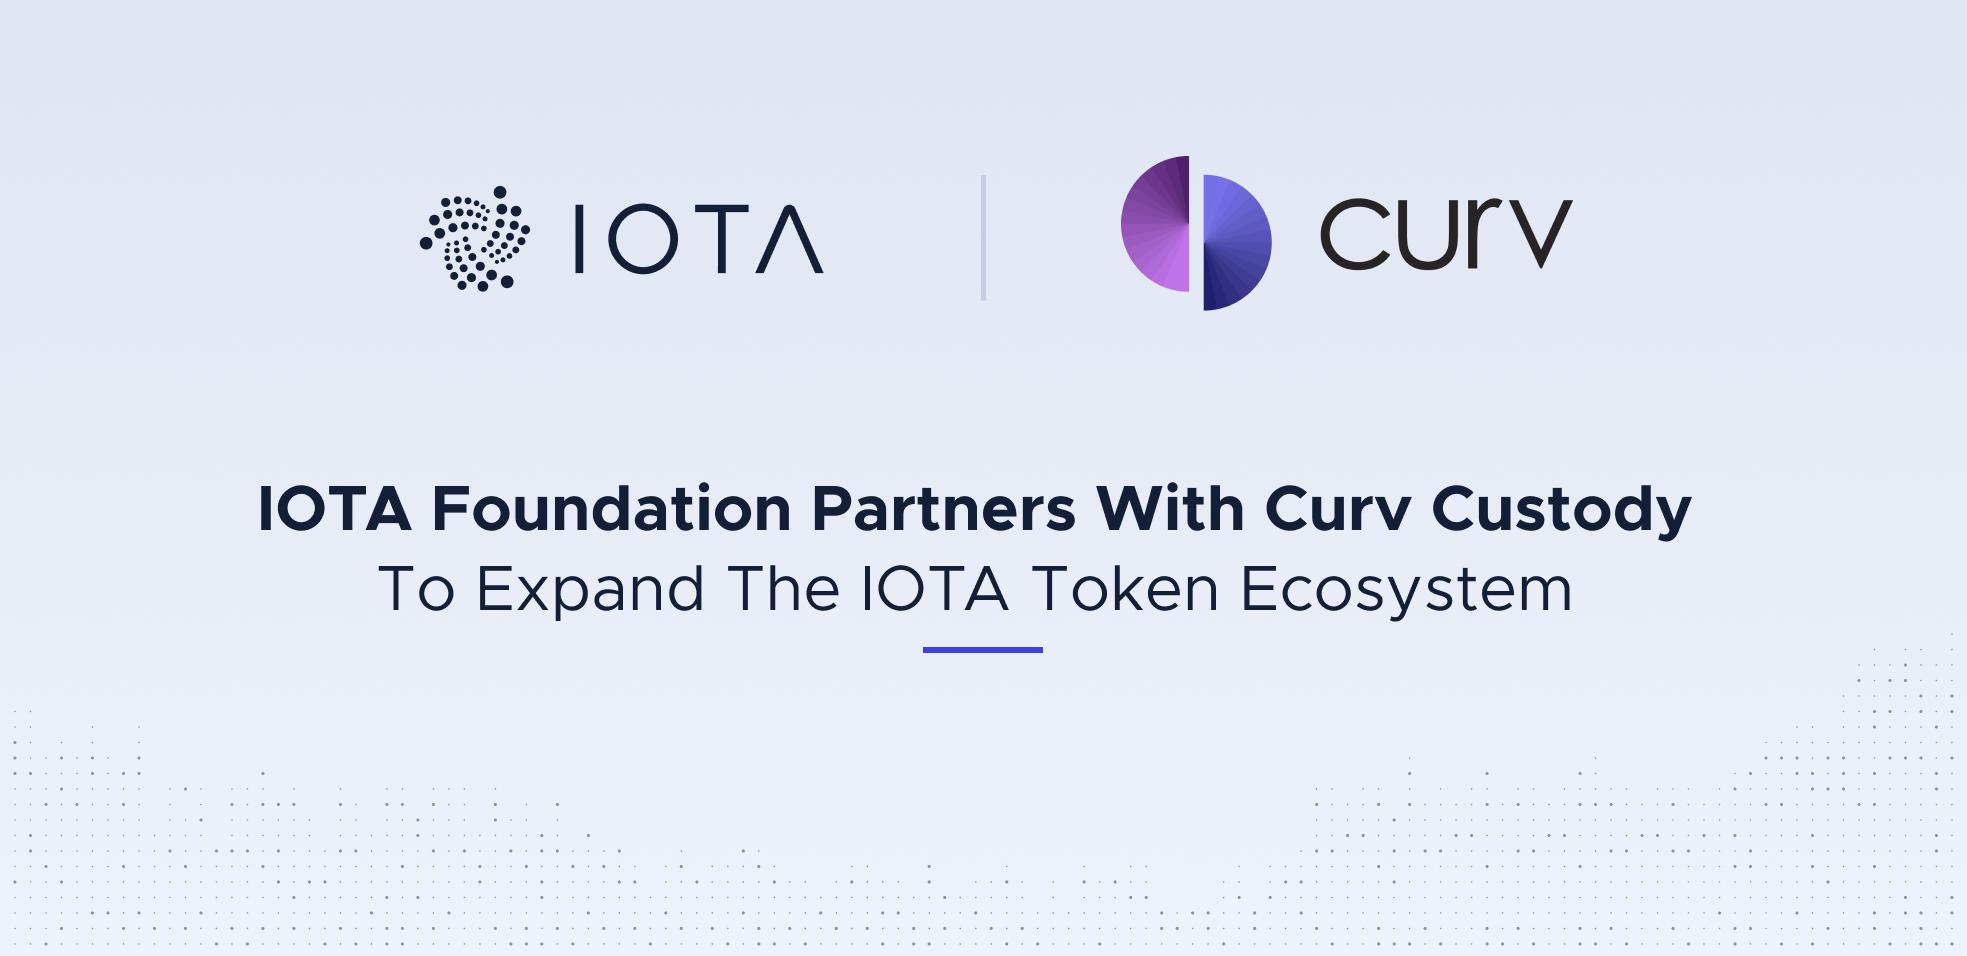 IOTA Foundation Partners With Curv Custody To Expand The IOTA Token Ecosystem\n(Thanks to Chrysalis!)